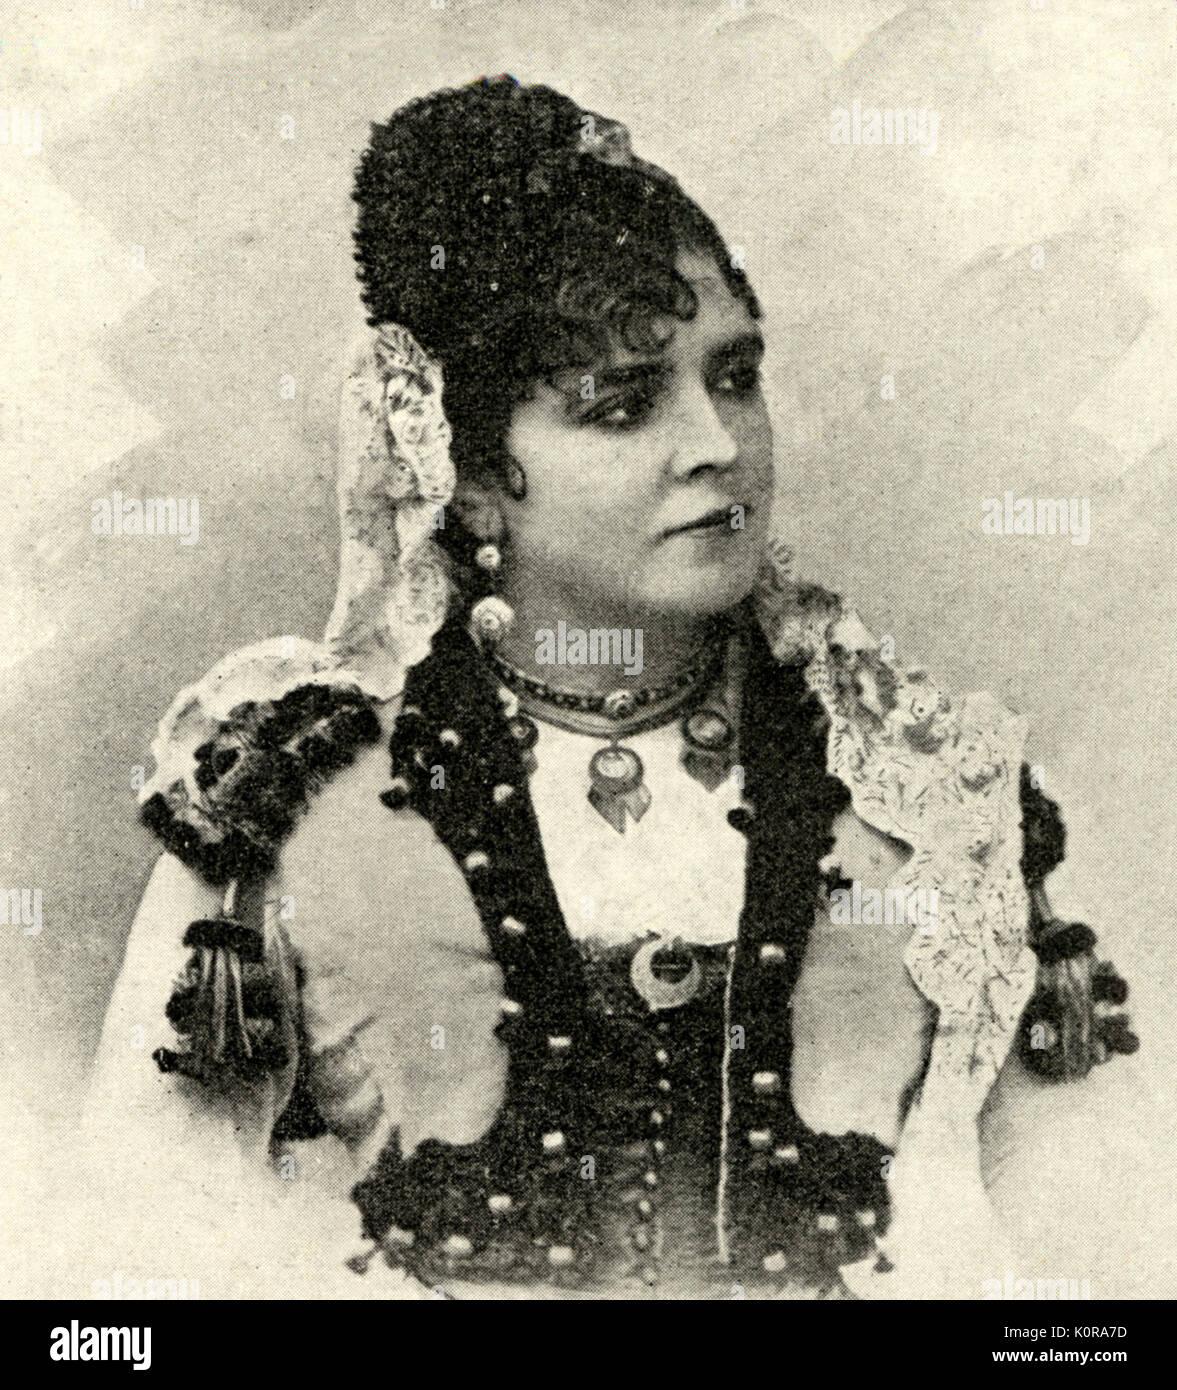 BIZET. 'Carmen'-GALLI-MARIE as first Carmen French composer (1838-1875) Galli-Marie, Celestine - French mezzo (1840-1905) - Stock Image